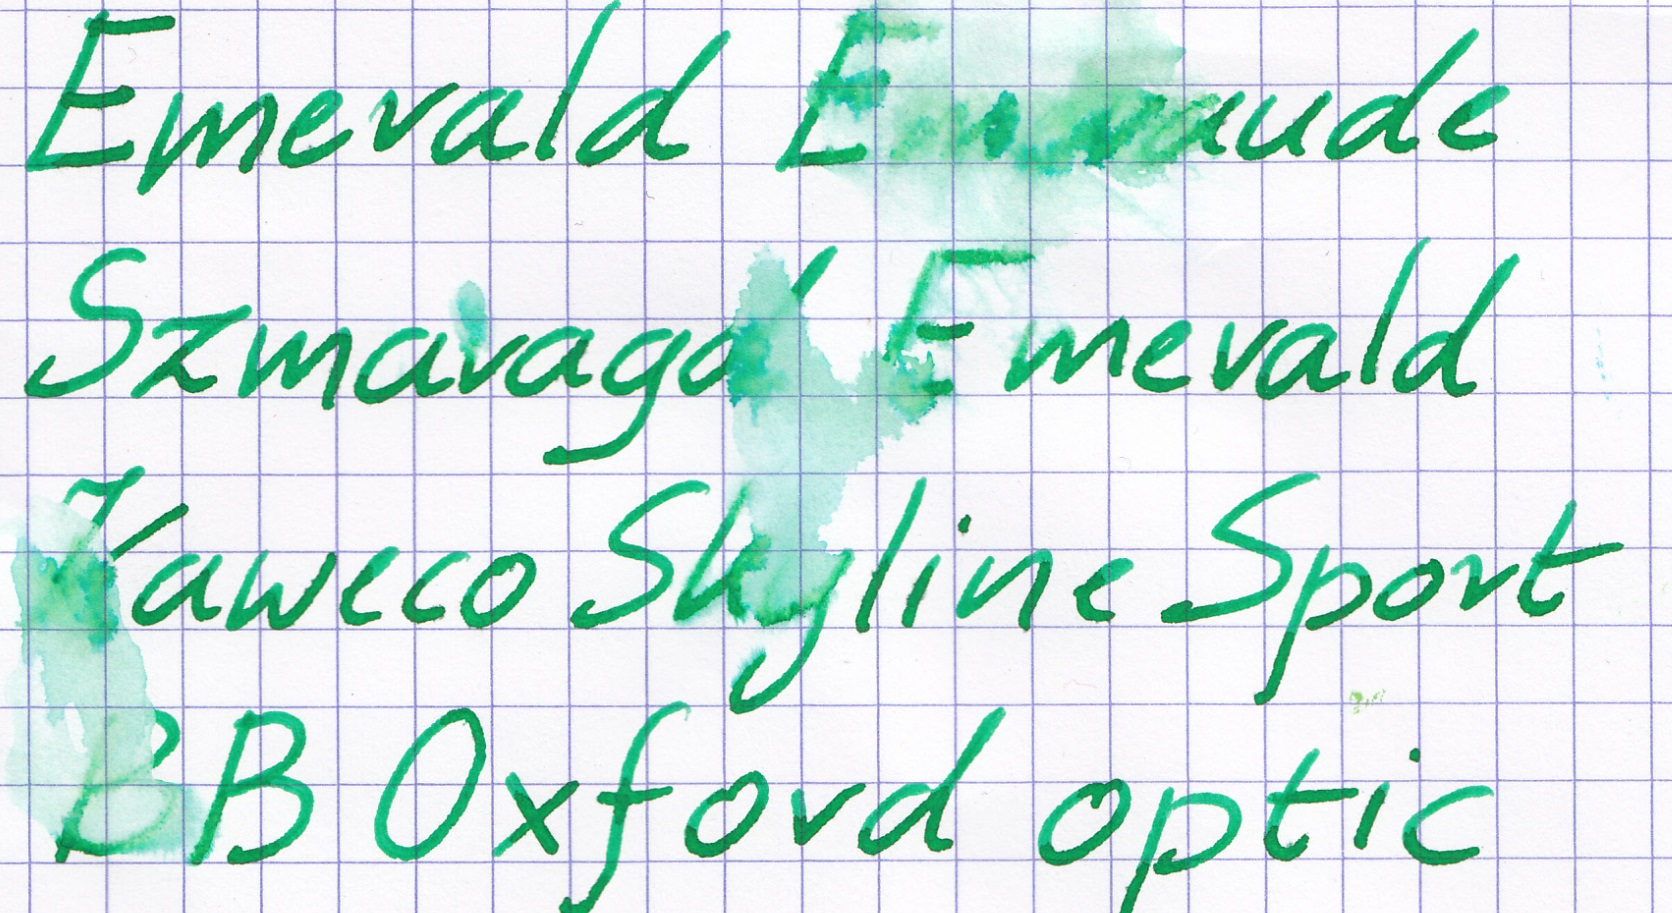 fpn_1465066266__emerald_oster_ox_1.jpg